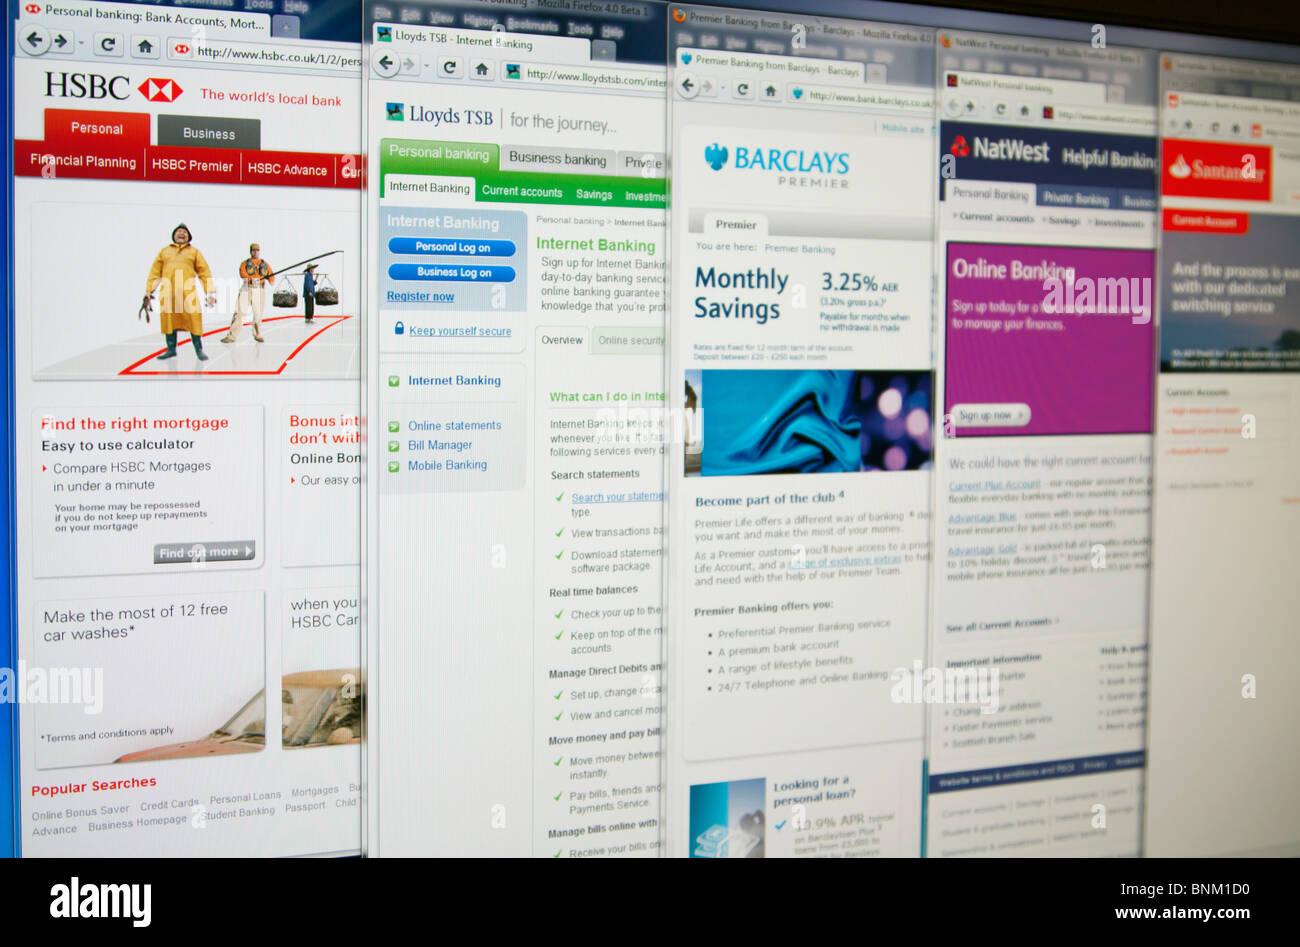 HSBC, Lloydstsb, Barclays, Natwest & Santander website homepages. - Stock Image